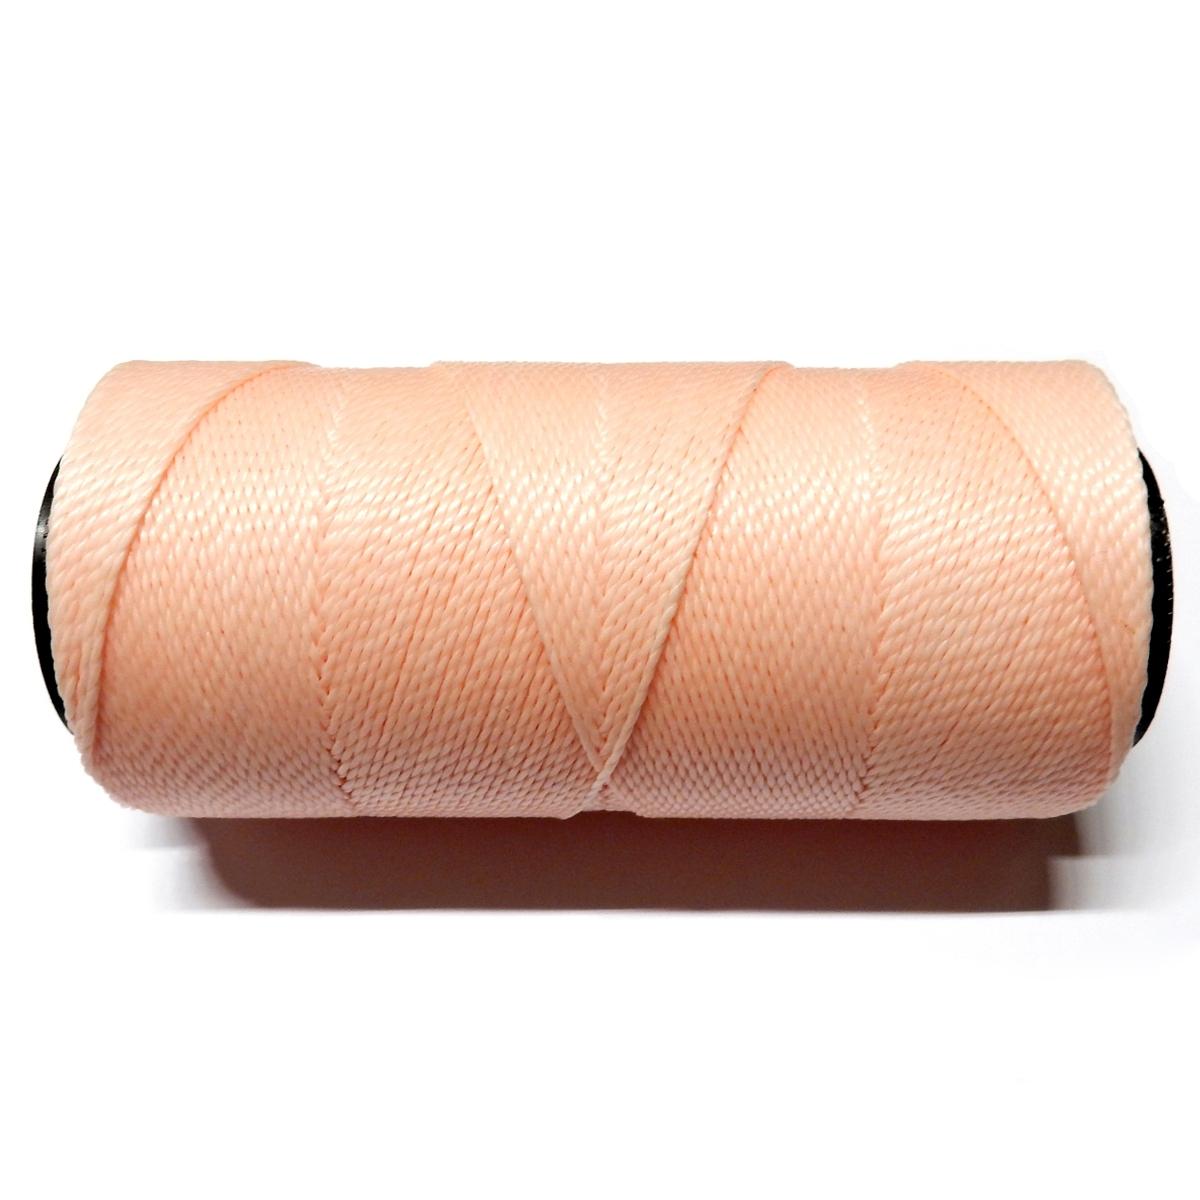 Encerado Brasileño Poliester 1mm - Rosa Claro 0366